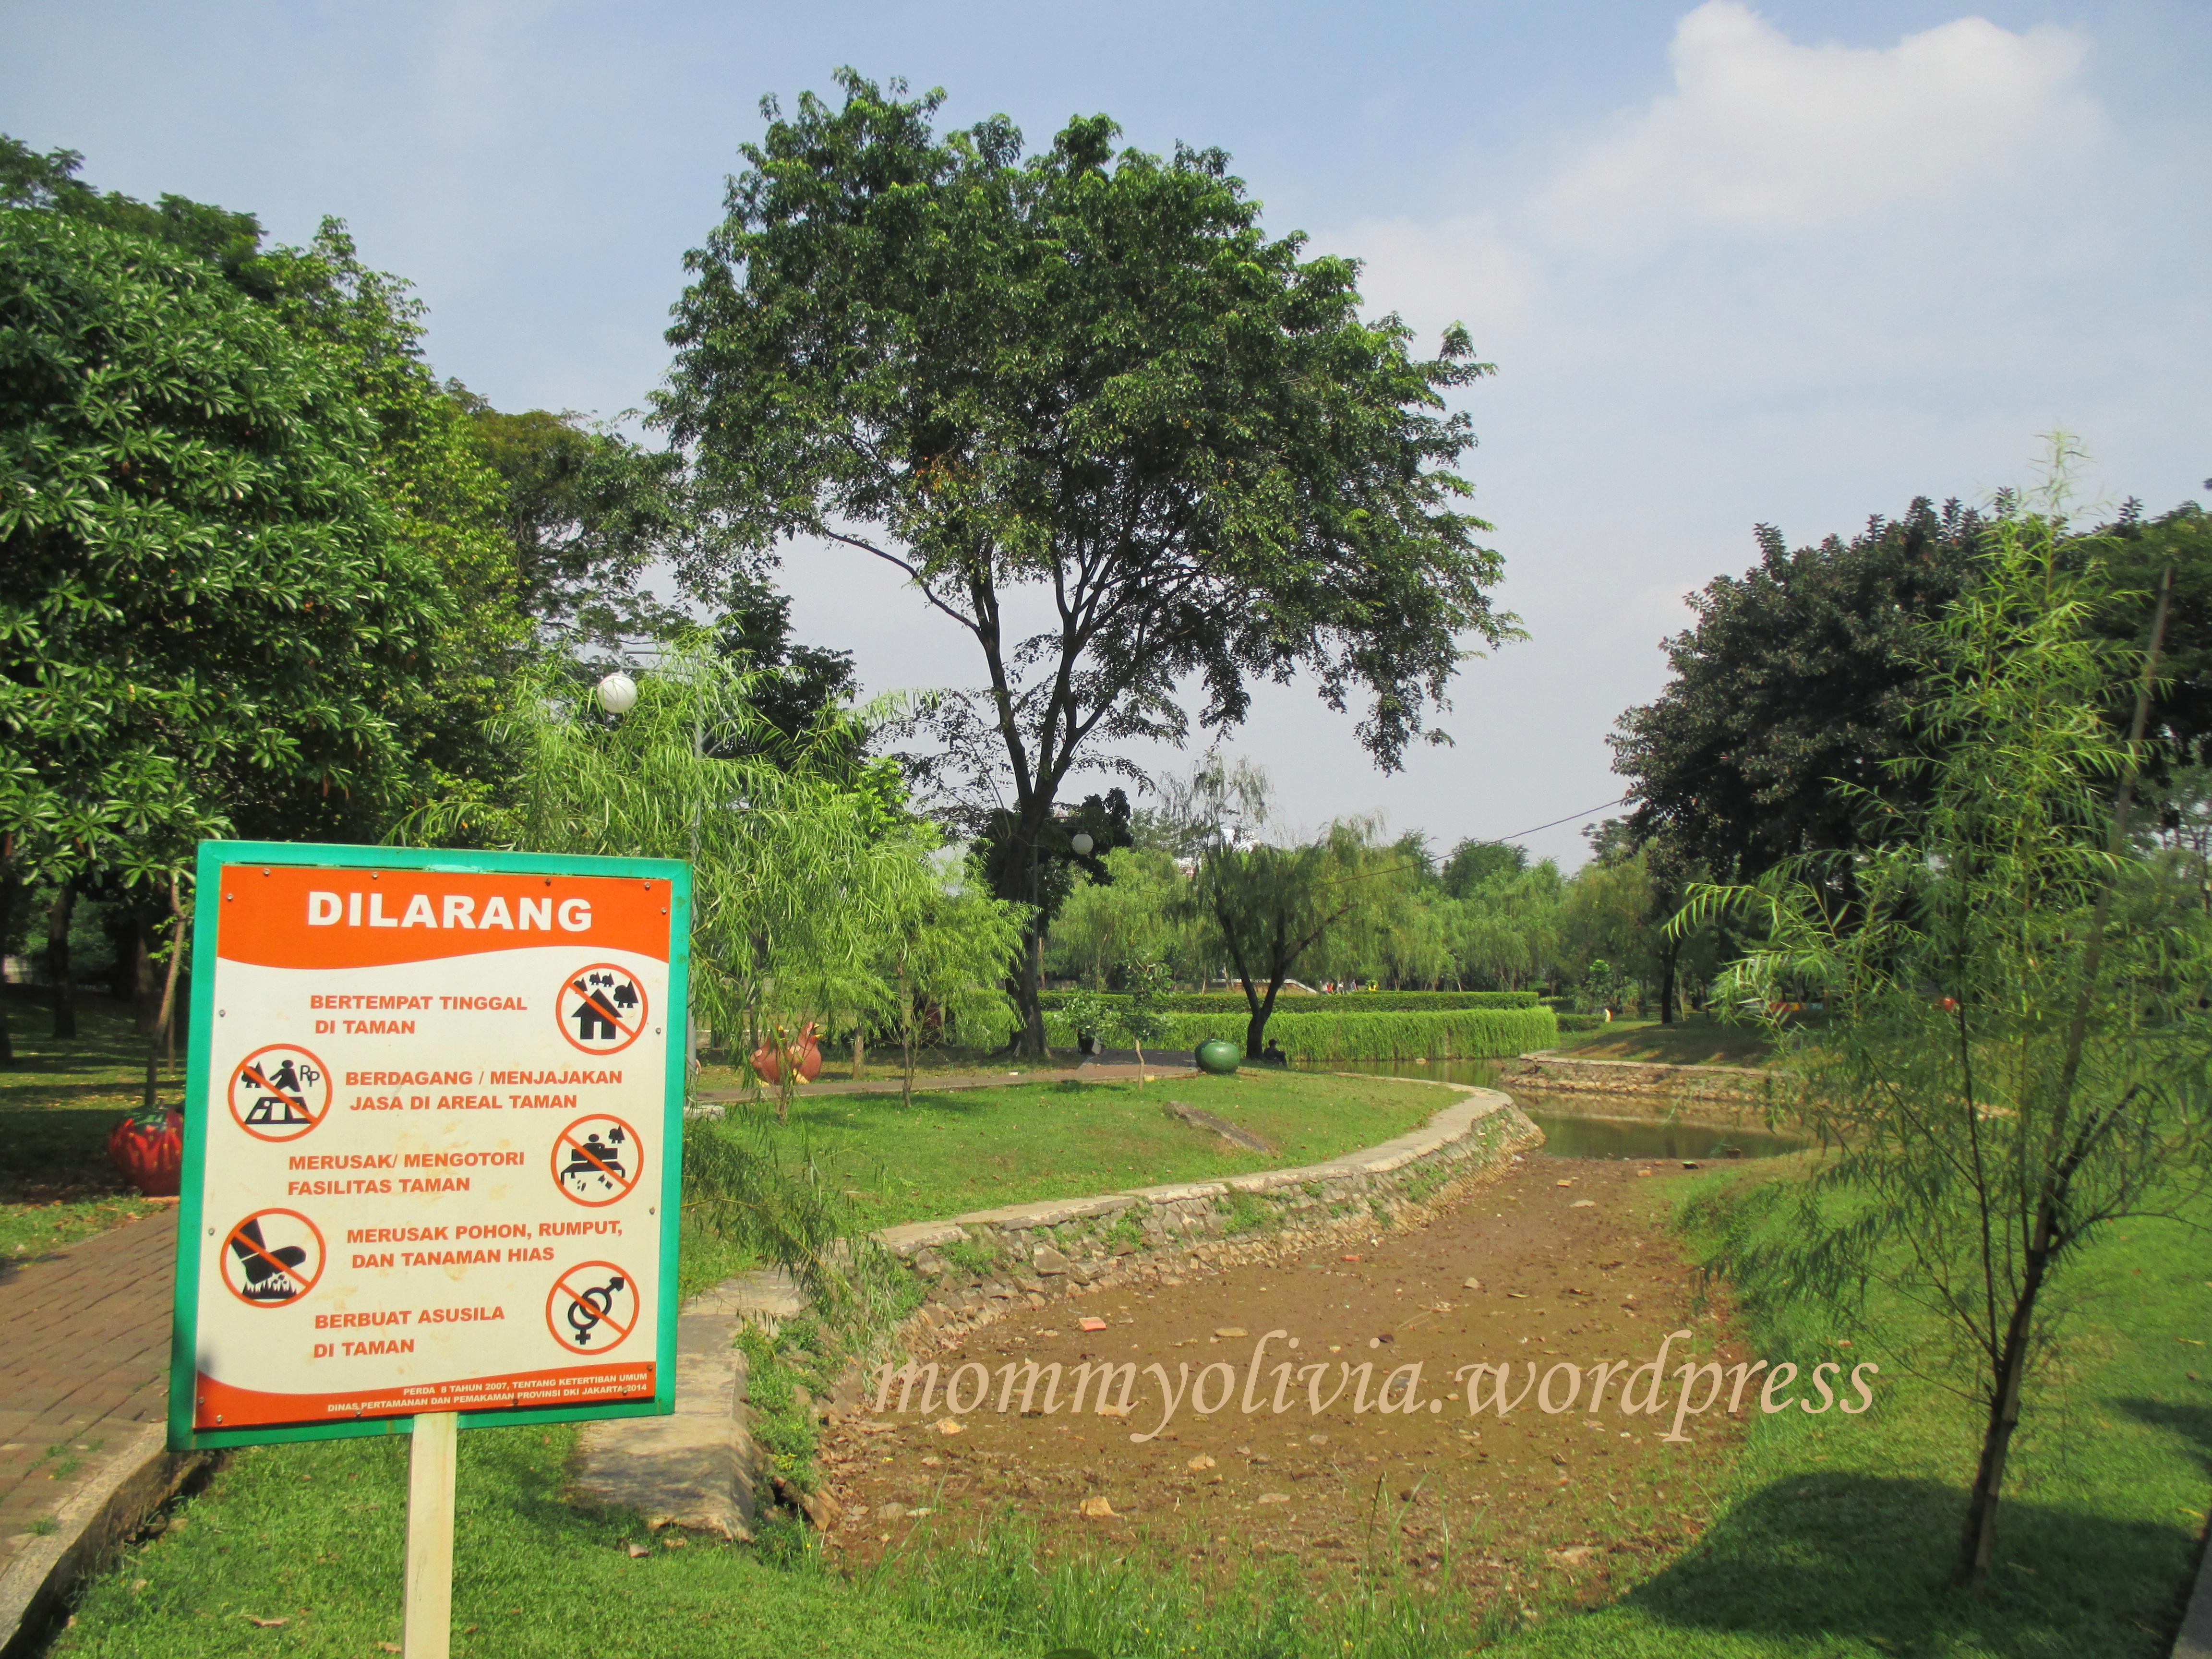 Piknik Taman Cattleya Tomang Simple Note Papan Hutan Kota Srengseng